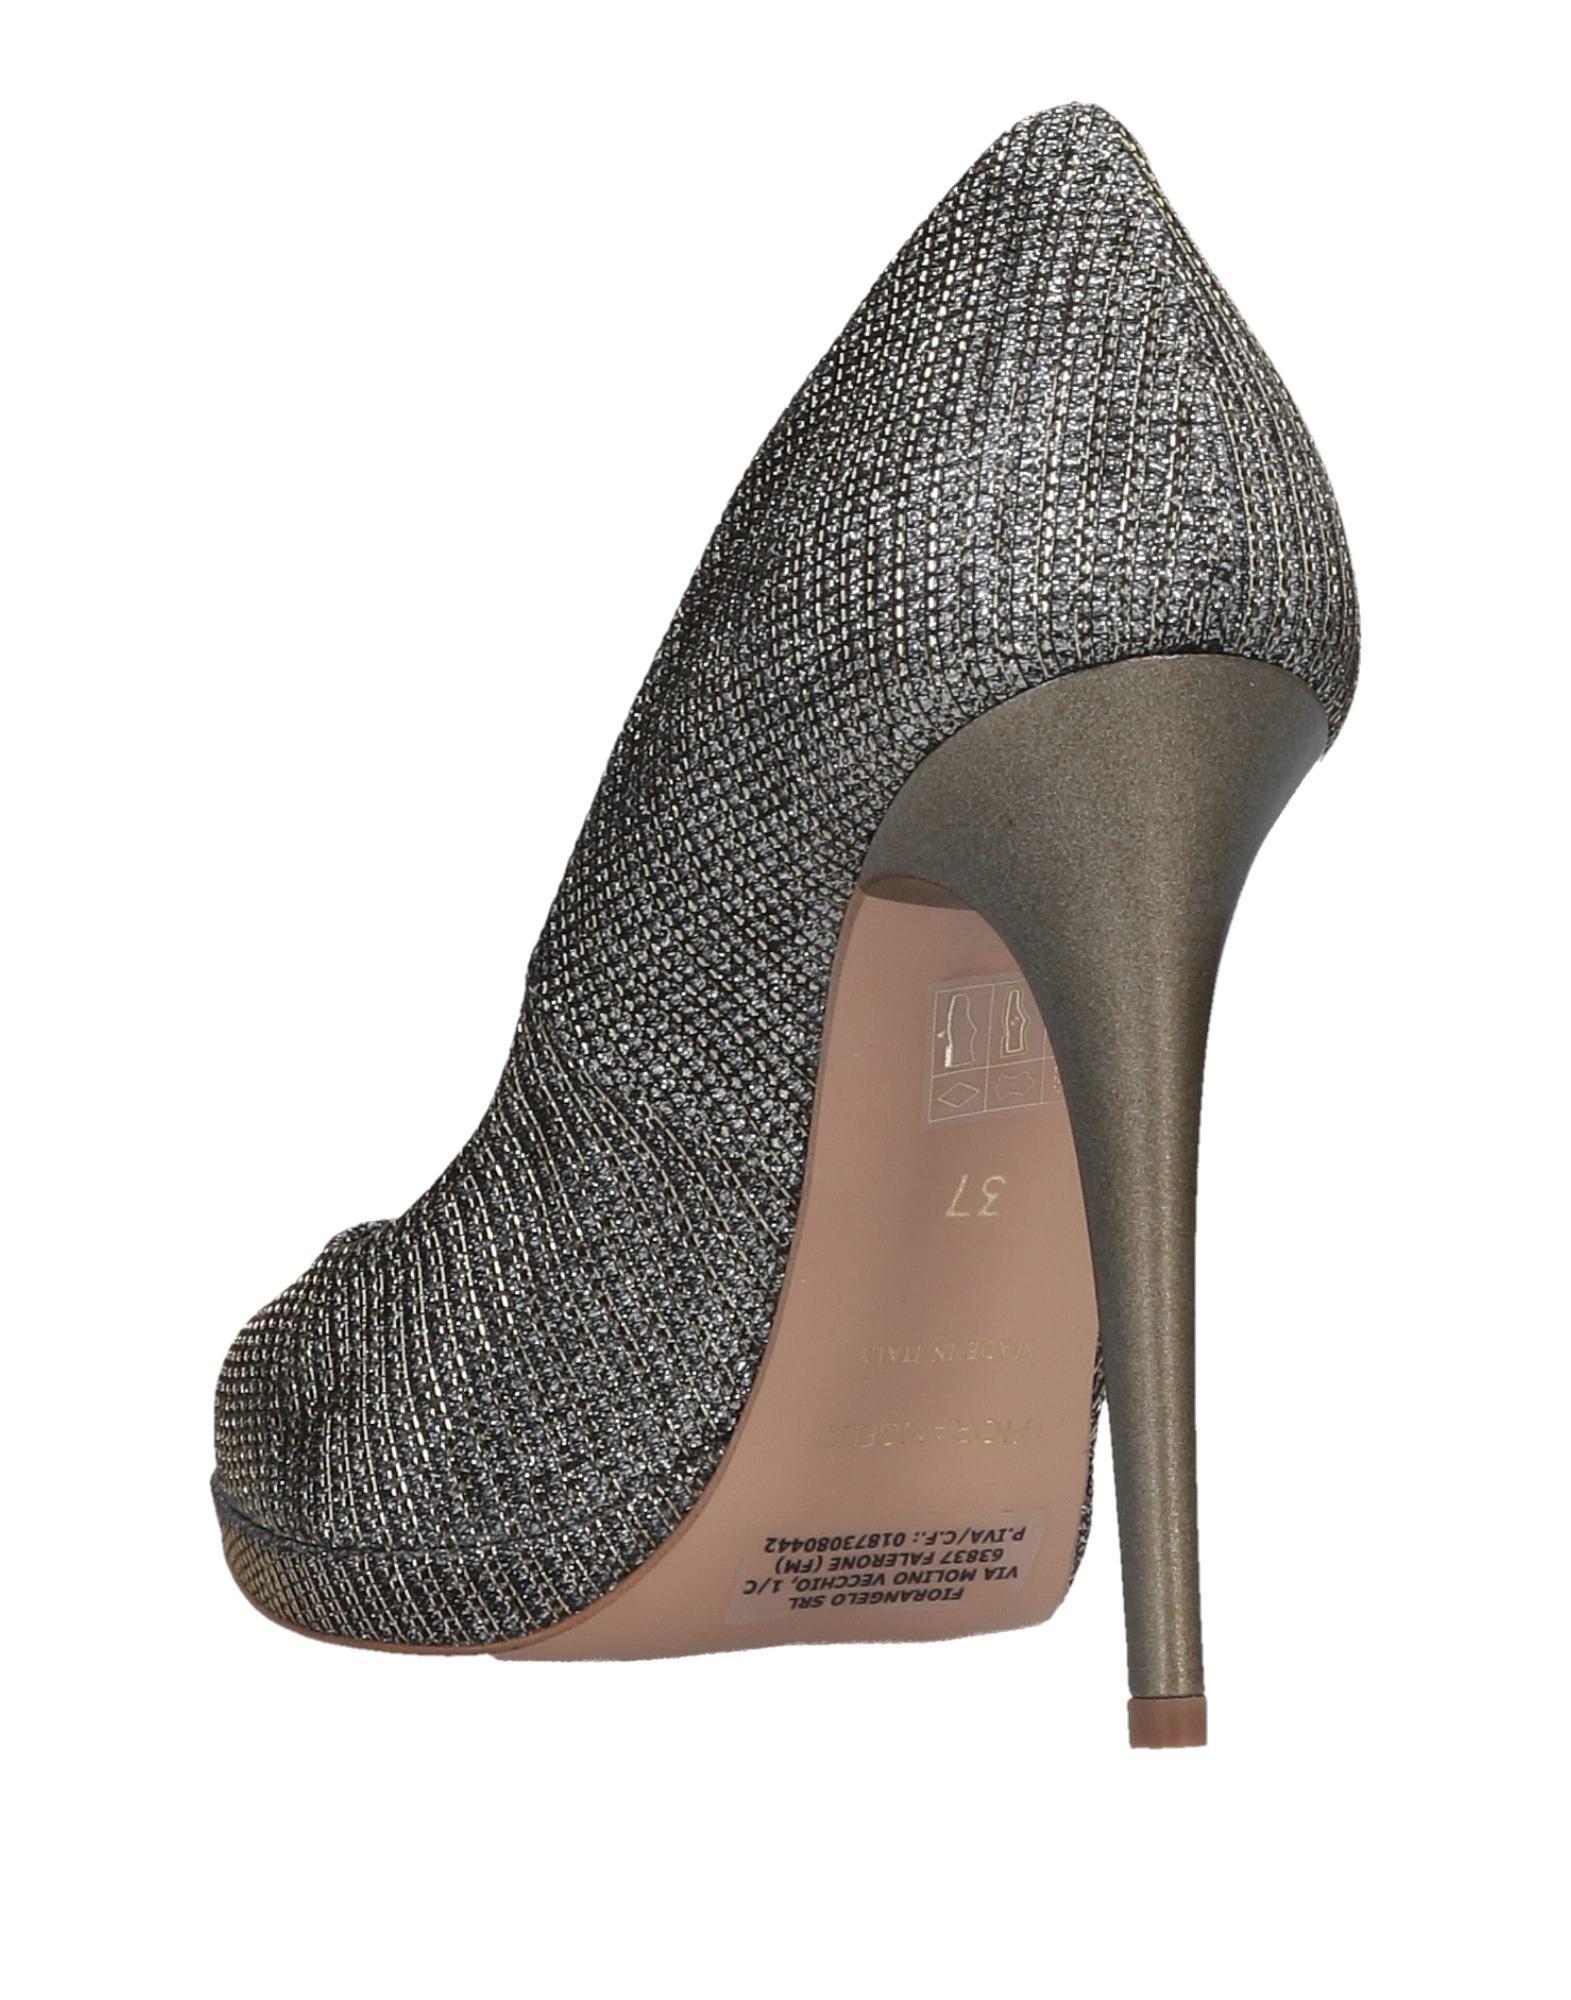 Stilvolle Damen billige Schuhe Fiorangelo Pumps Damen Stilvolle  11511532MU 1dc967